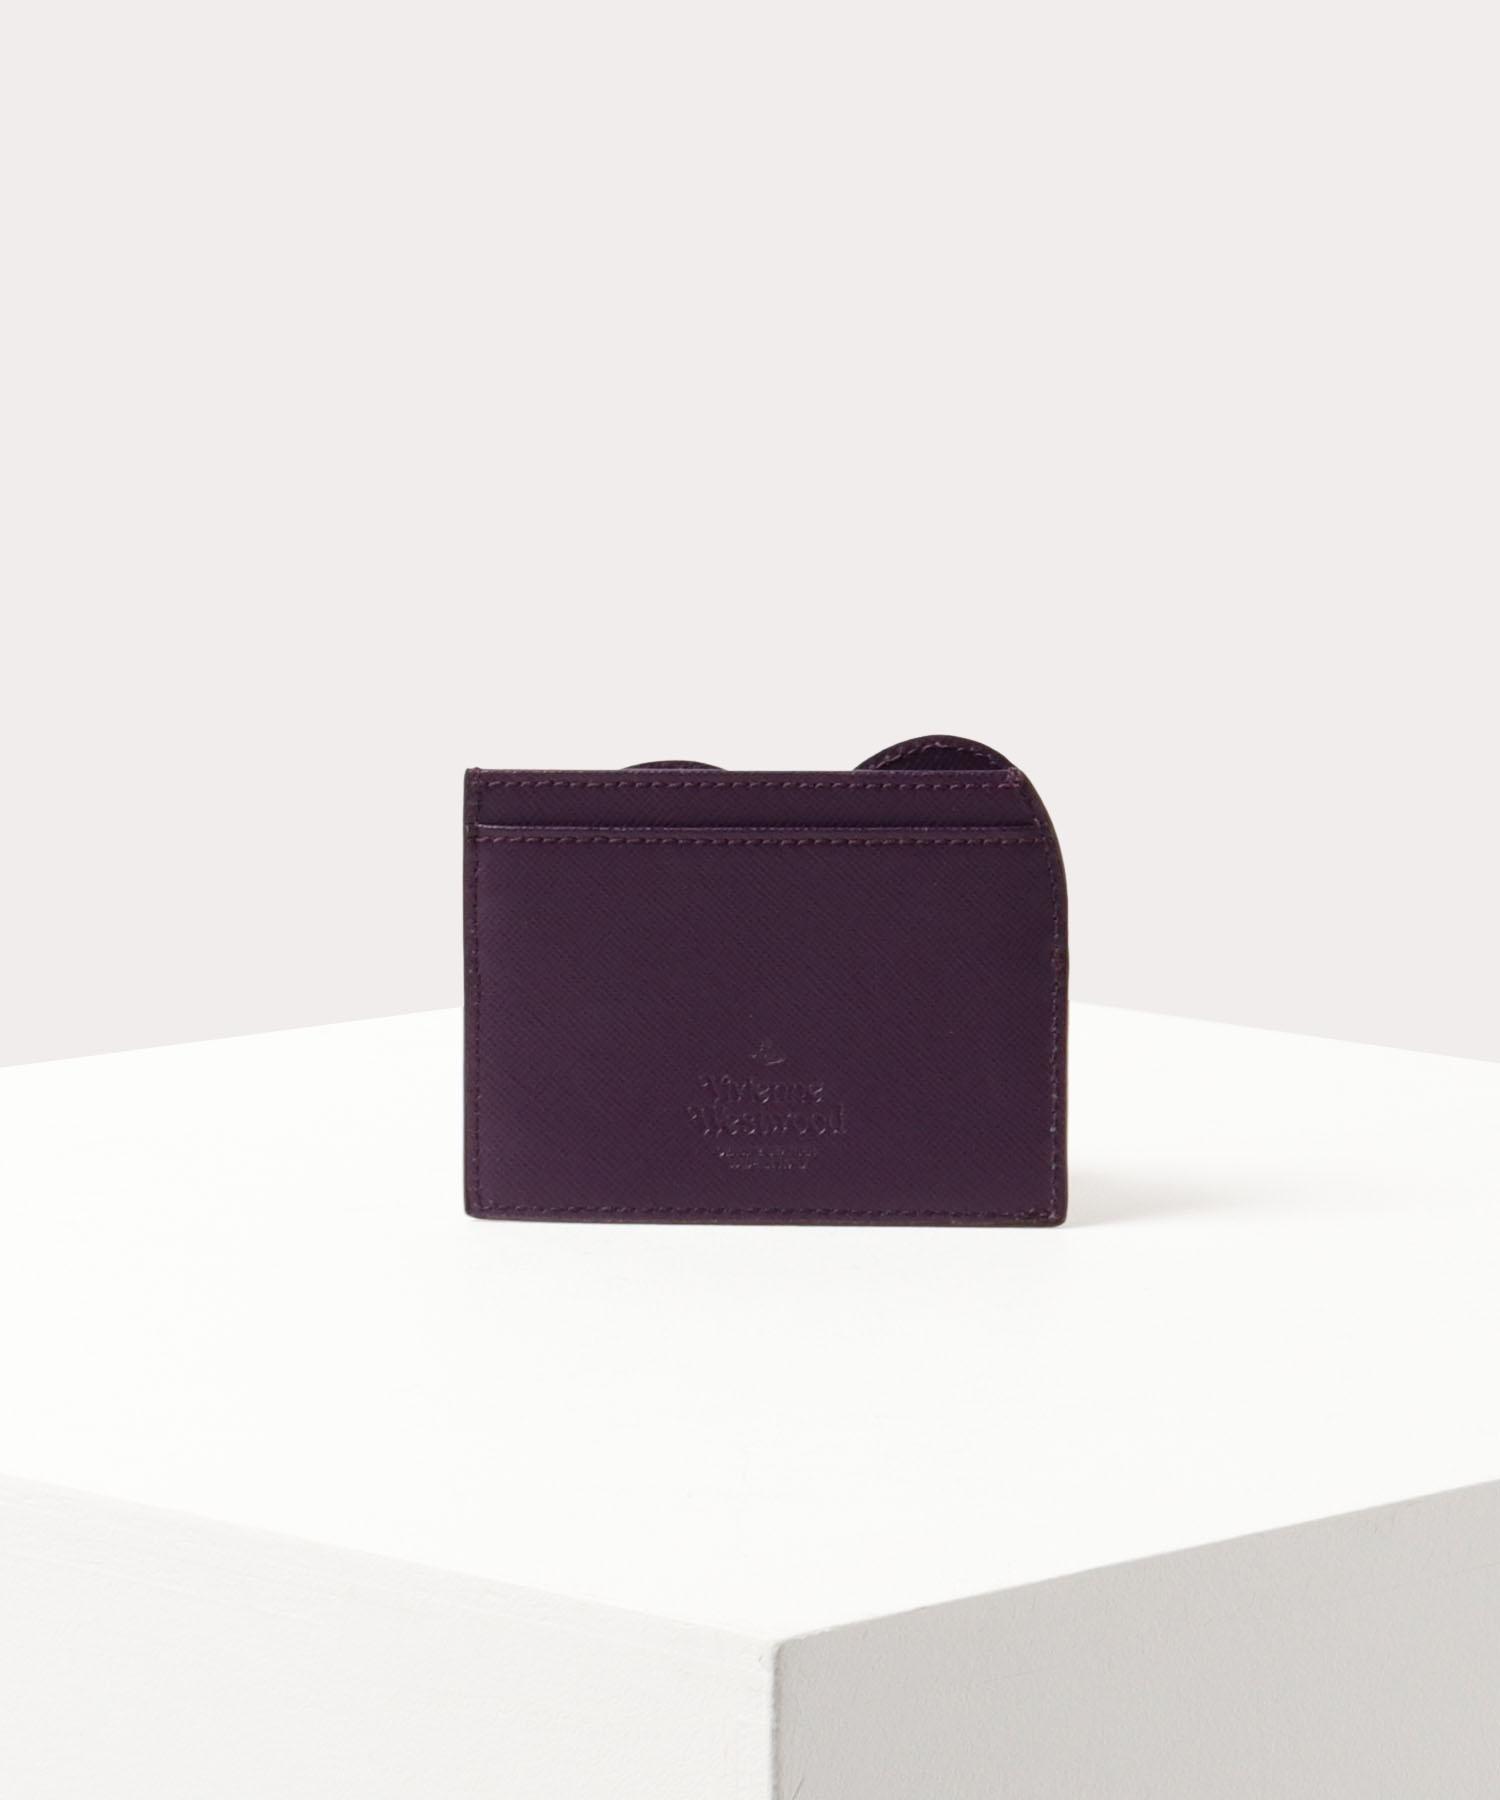 DEBBIE ハートカードケース